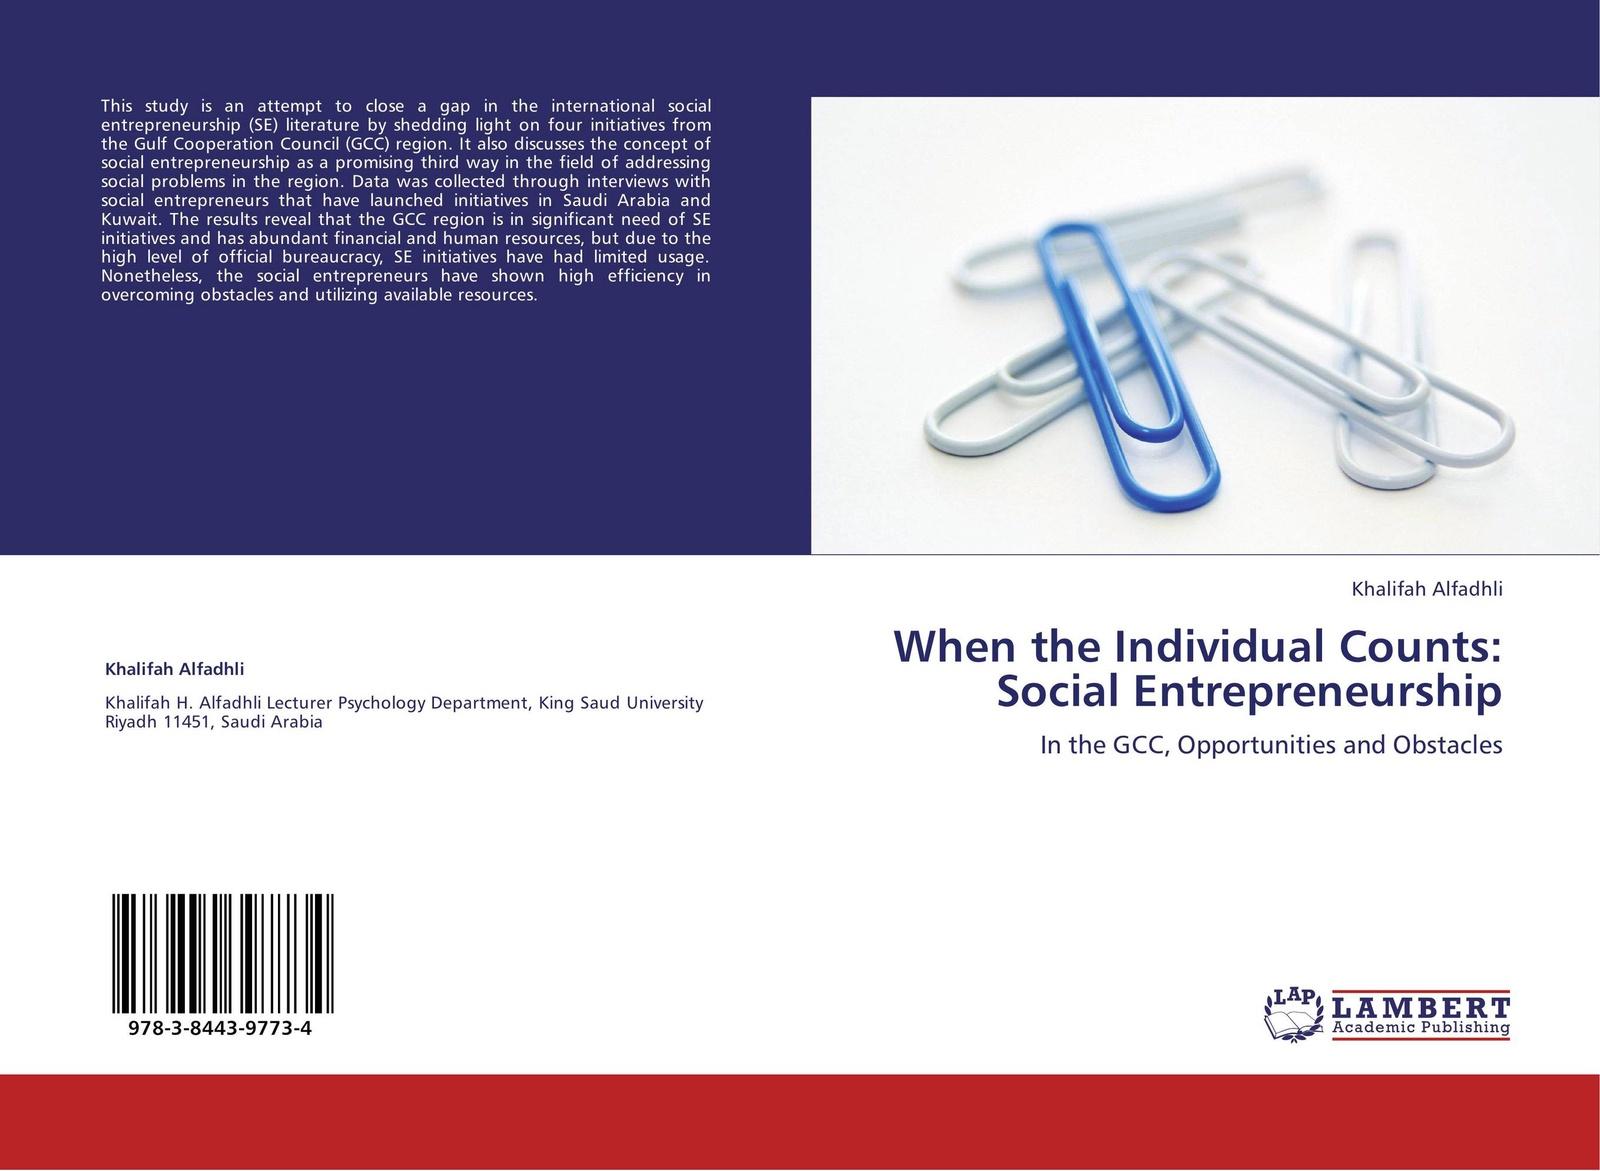 Khalifah Alfadhli When the Individual Counts: Social Entrepreneurship mark durieux social entrepreneurship for dummies